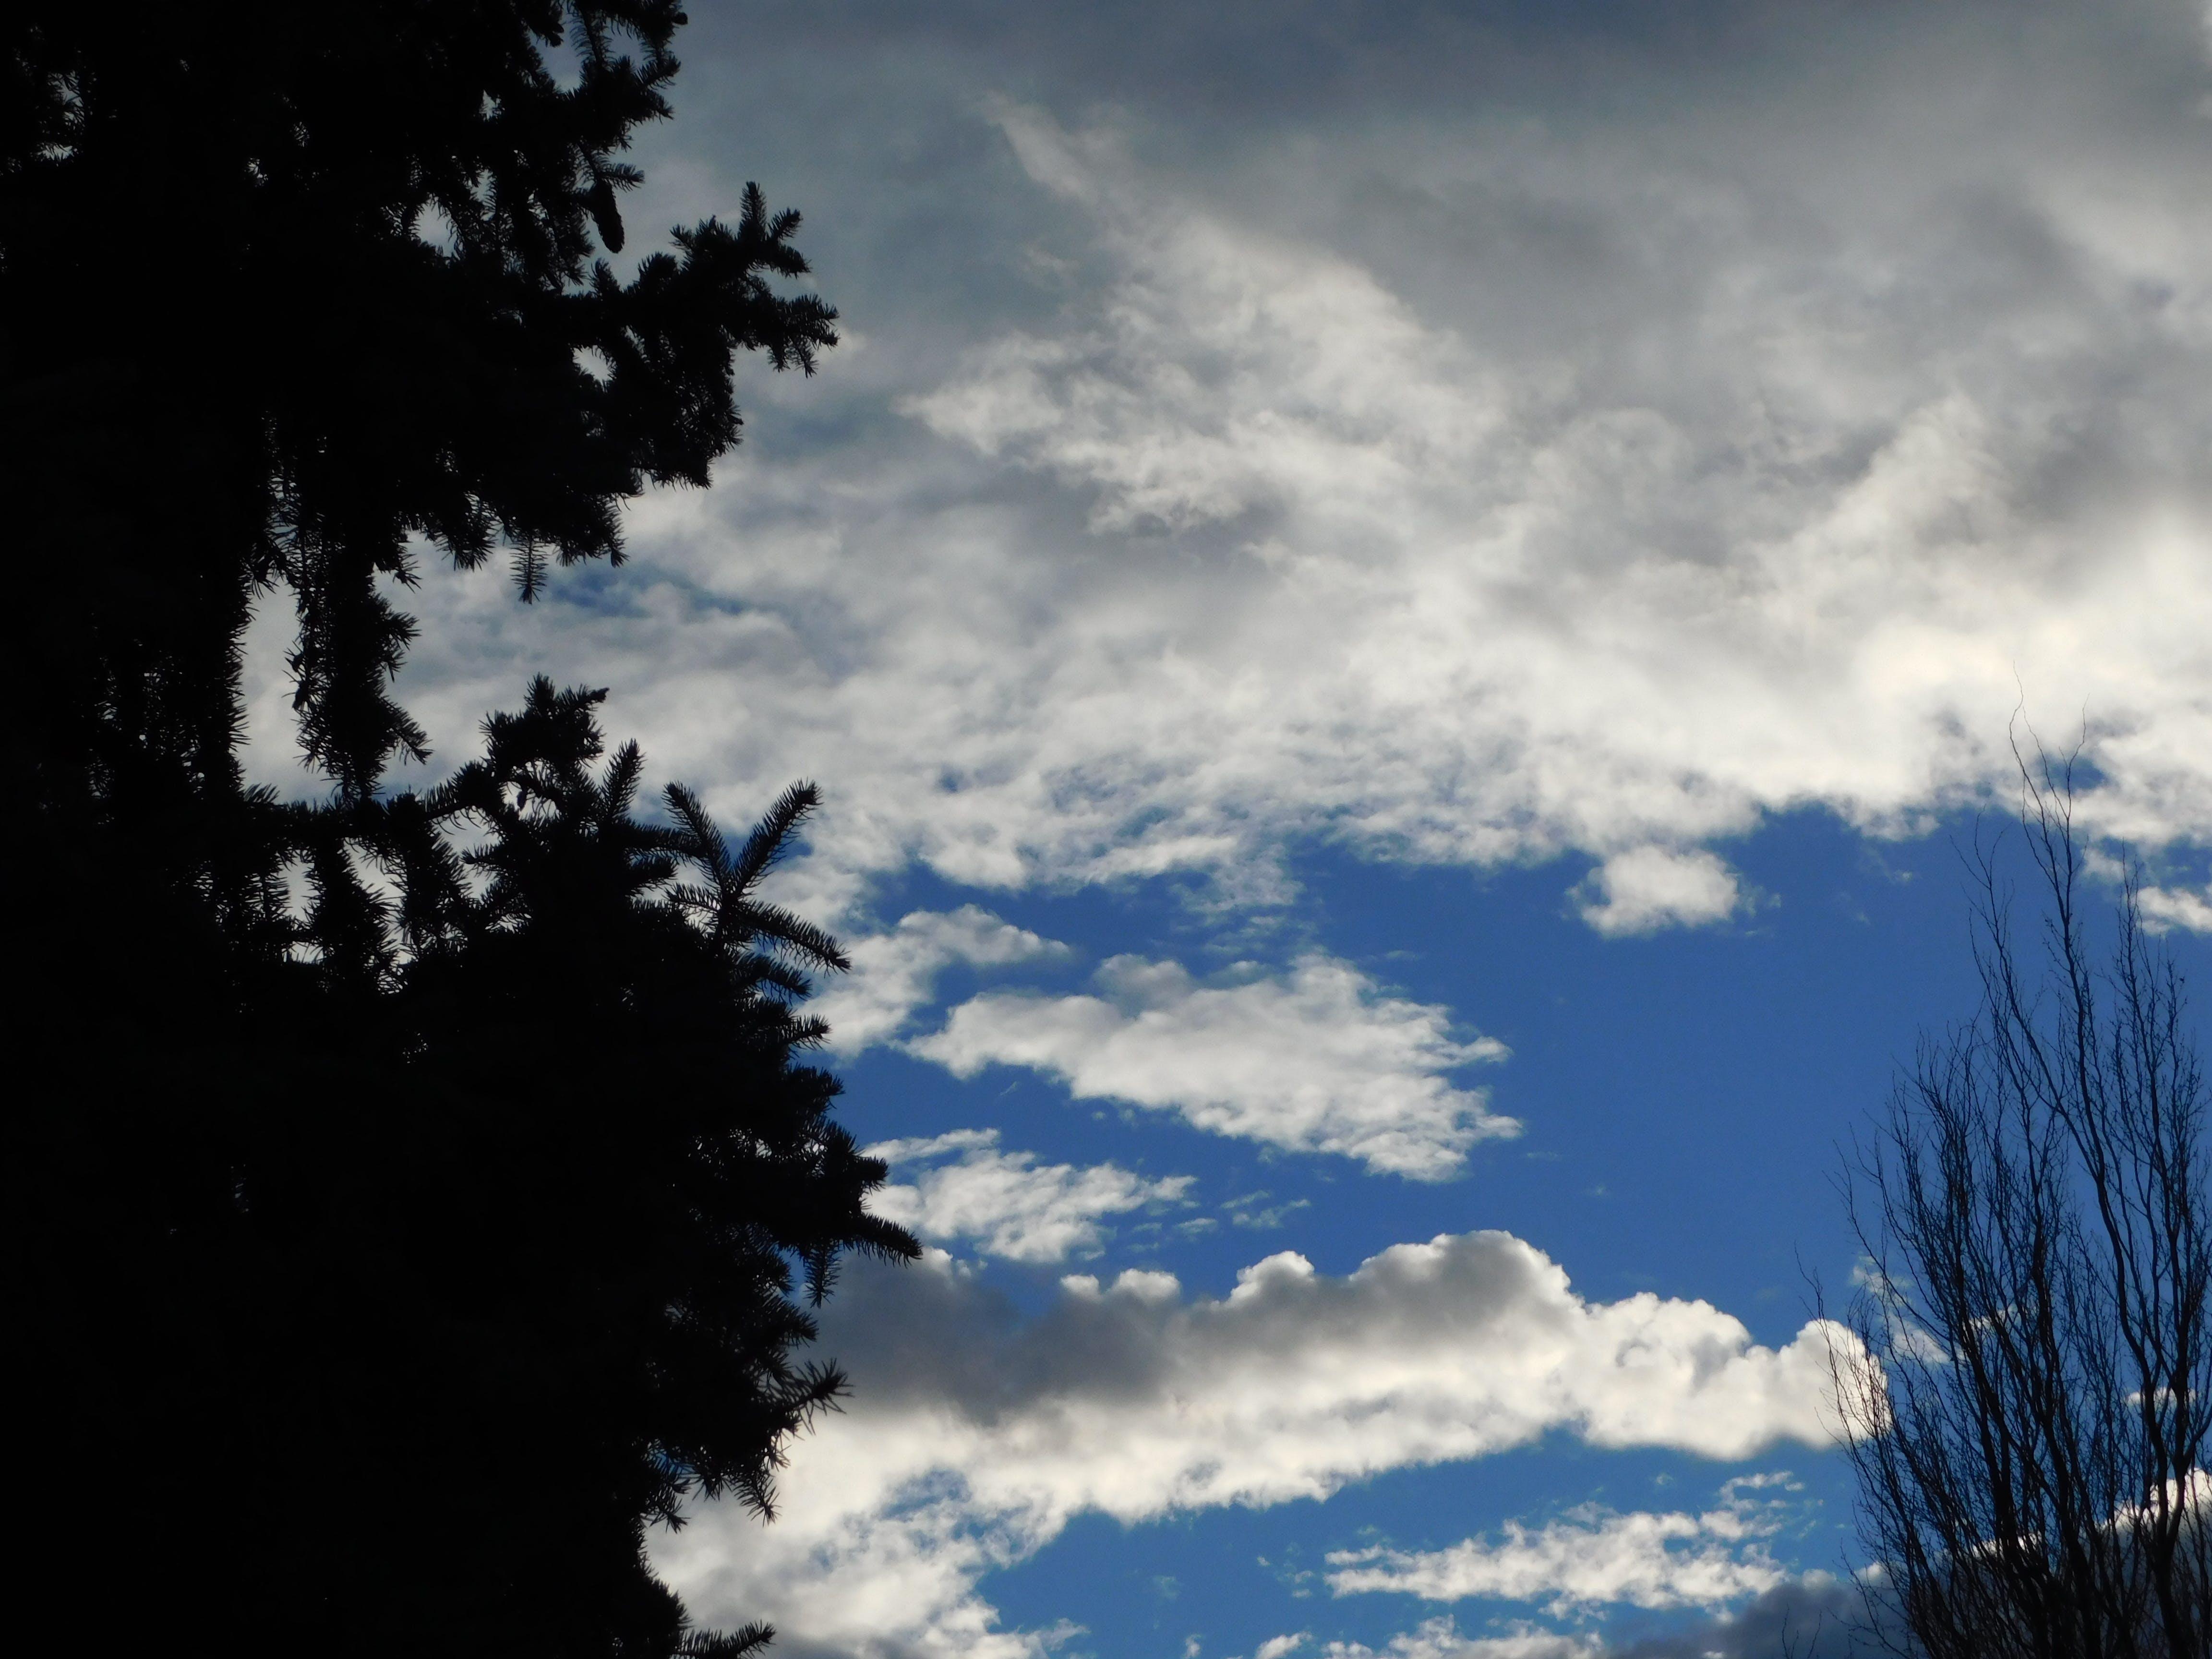 Free stock photo of Winter sky